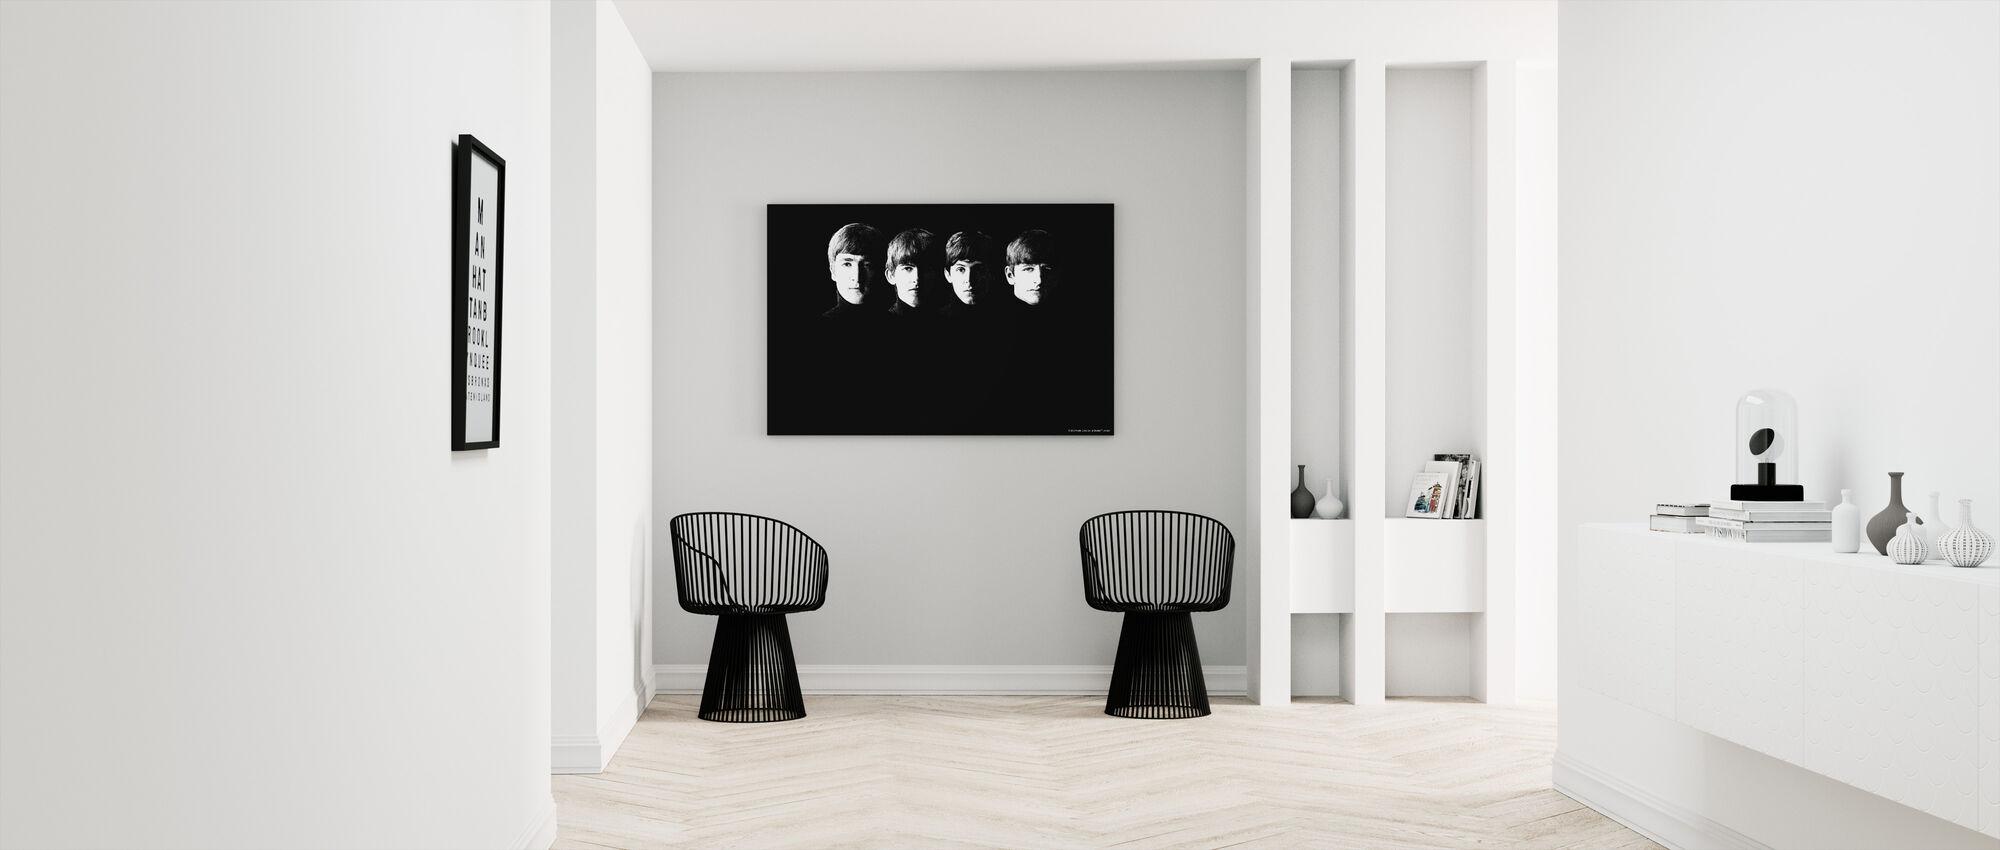 Beatles - ziarniste - Obraz na płótnie - Przedpokój